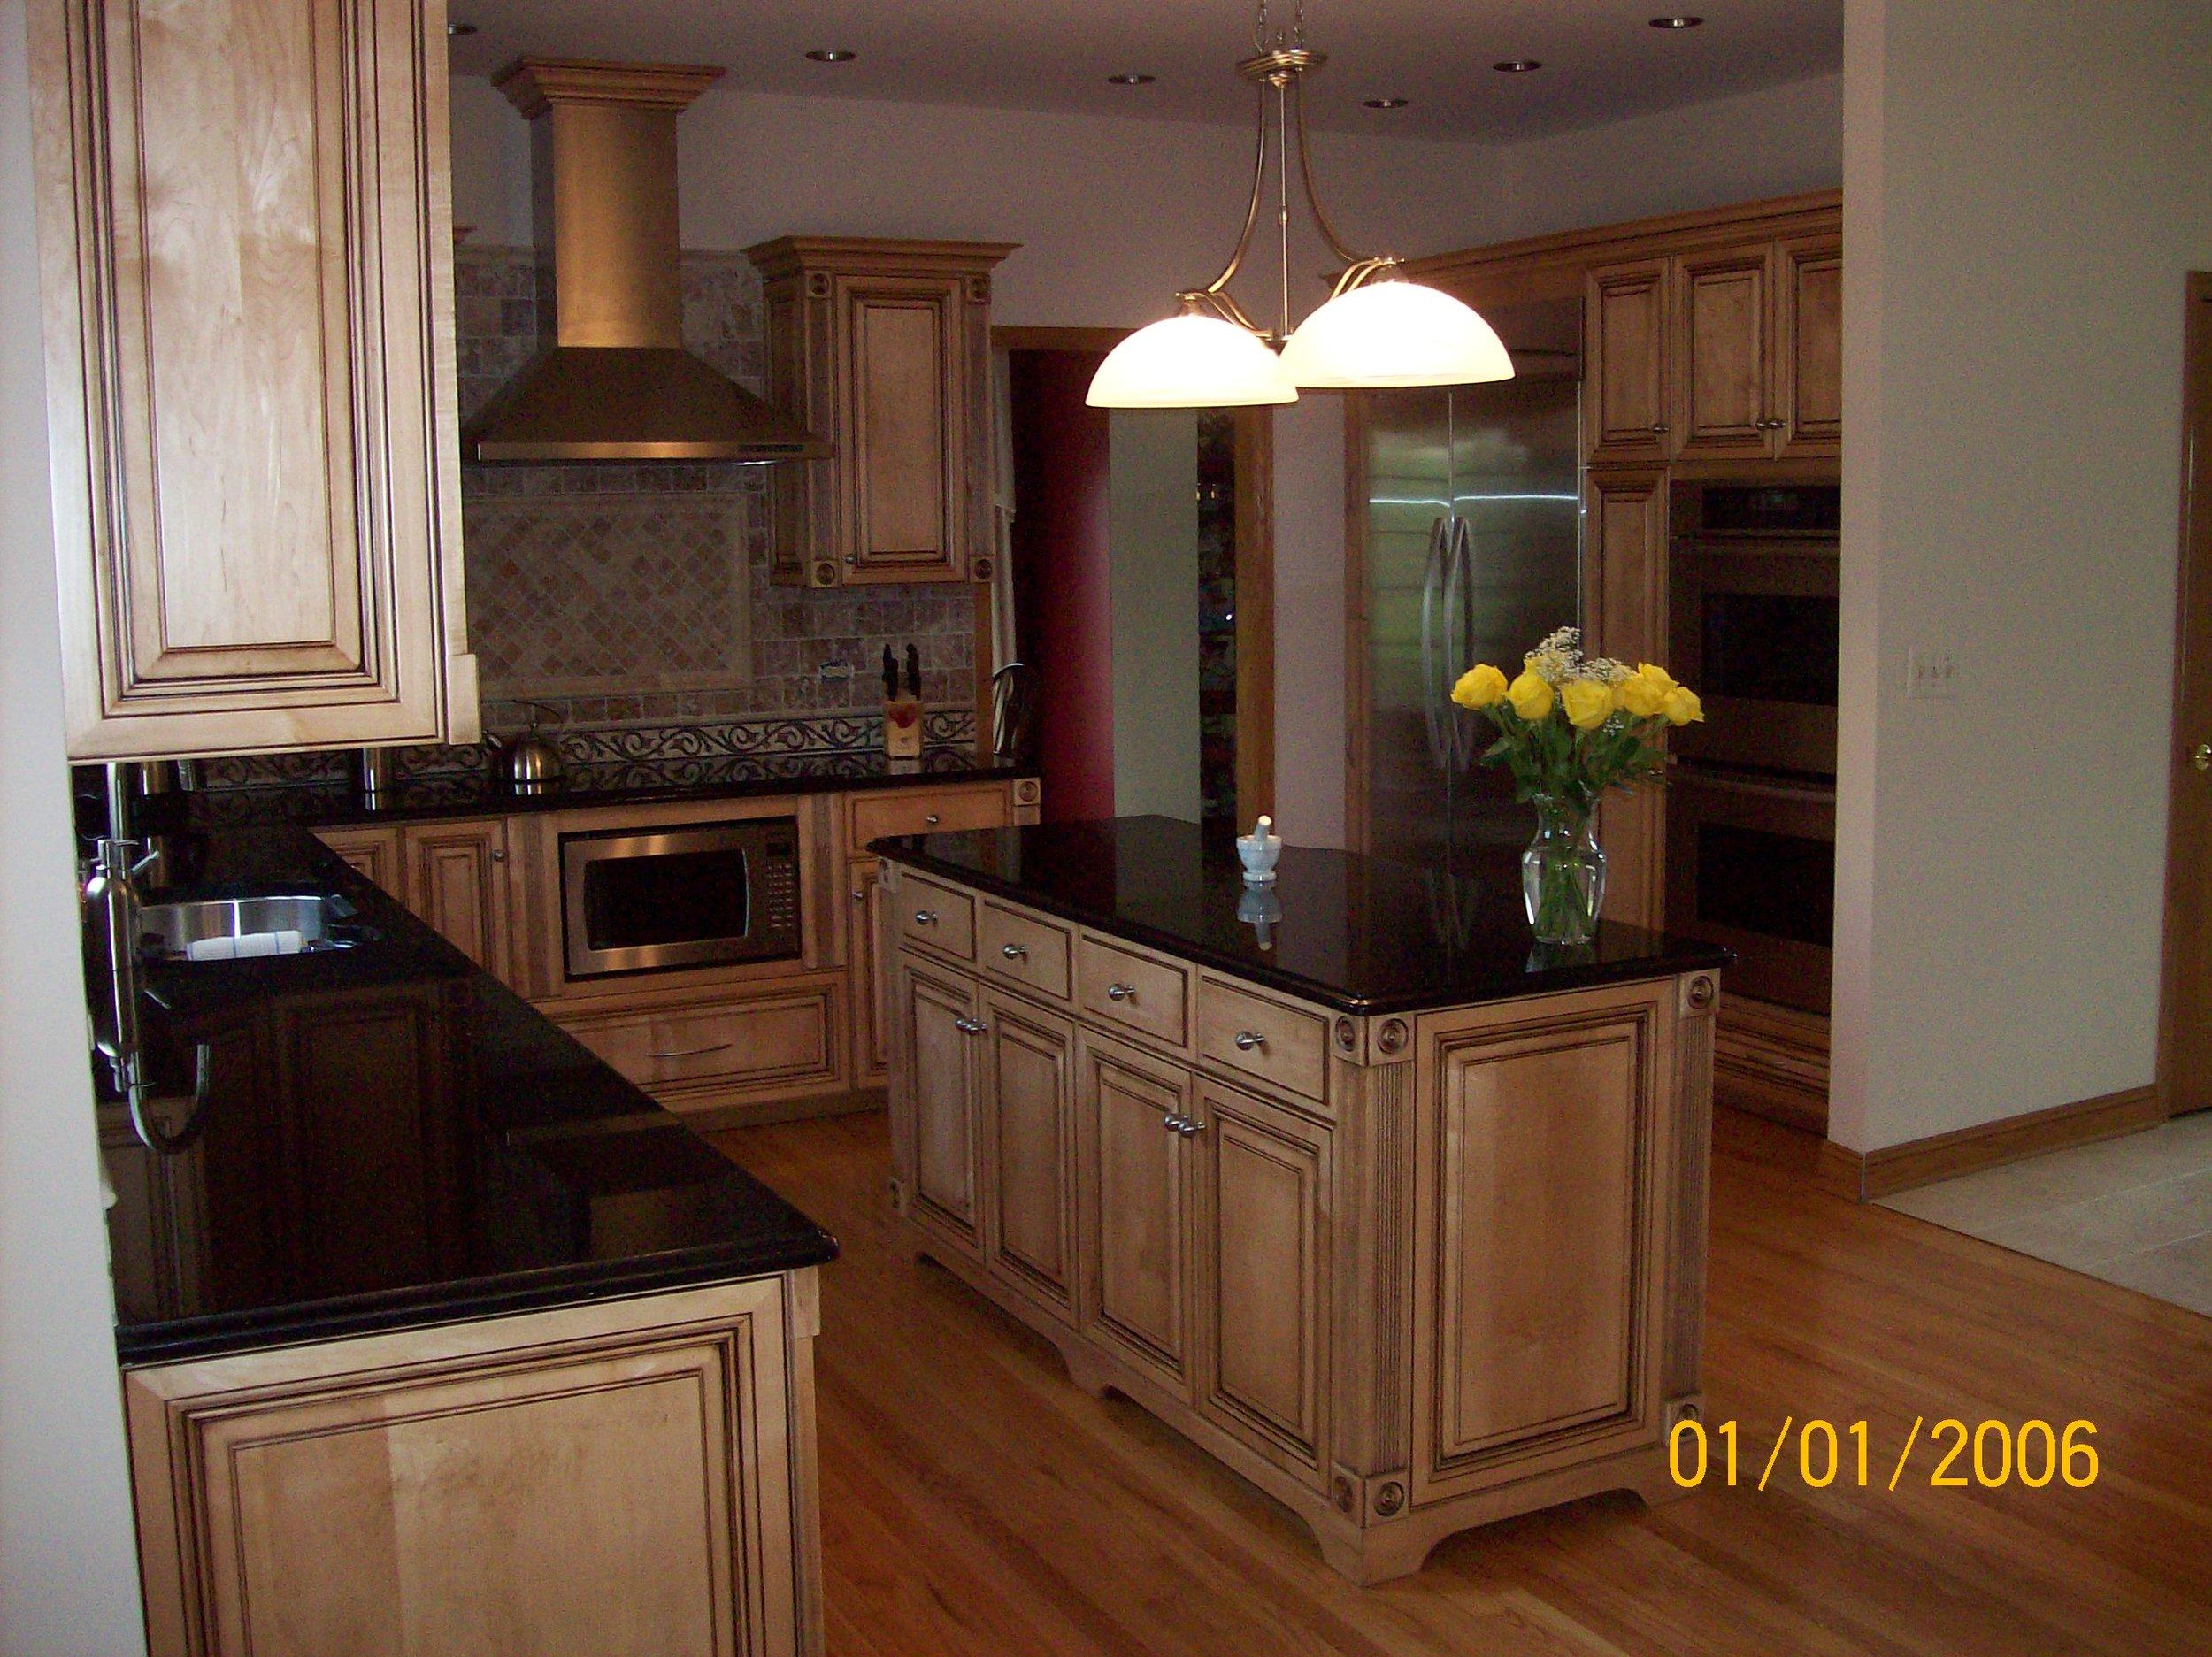 Talladega and Kitchens 012.jpg